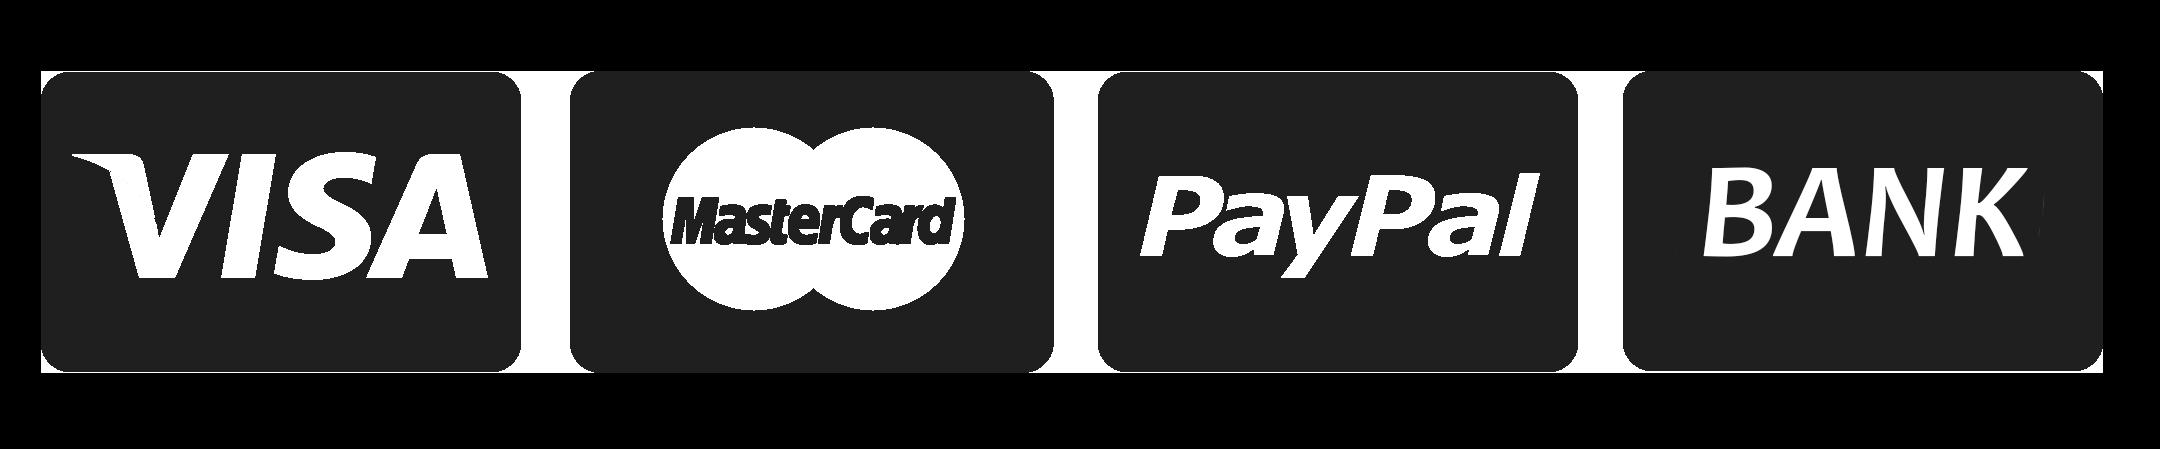 visa master paypal bank transparent